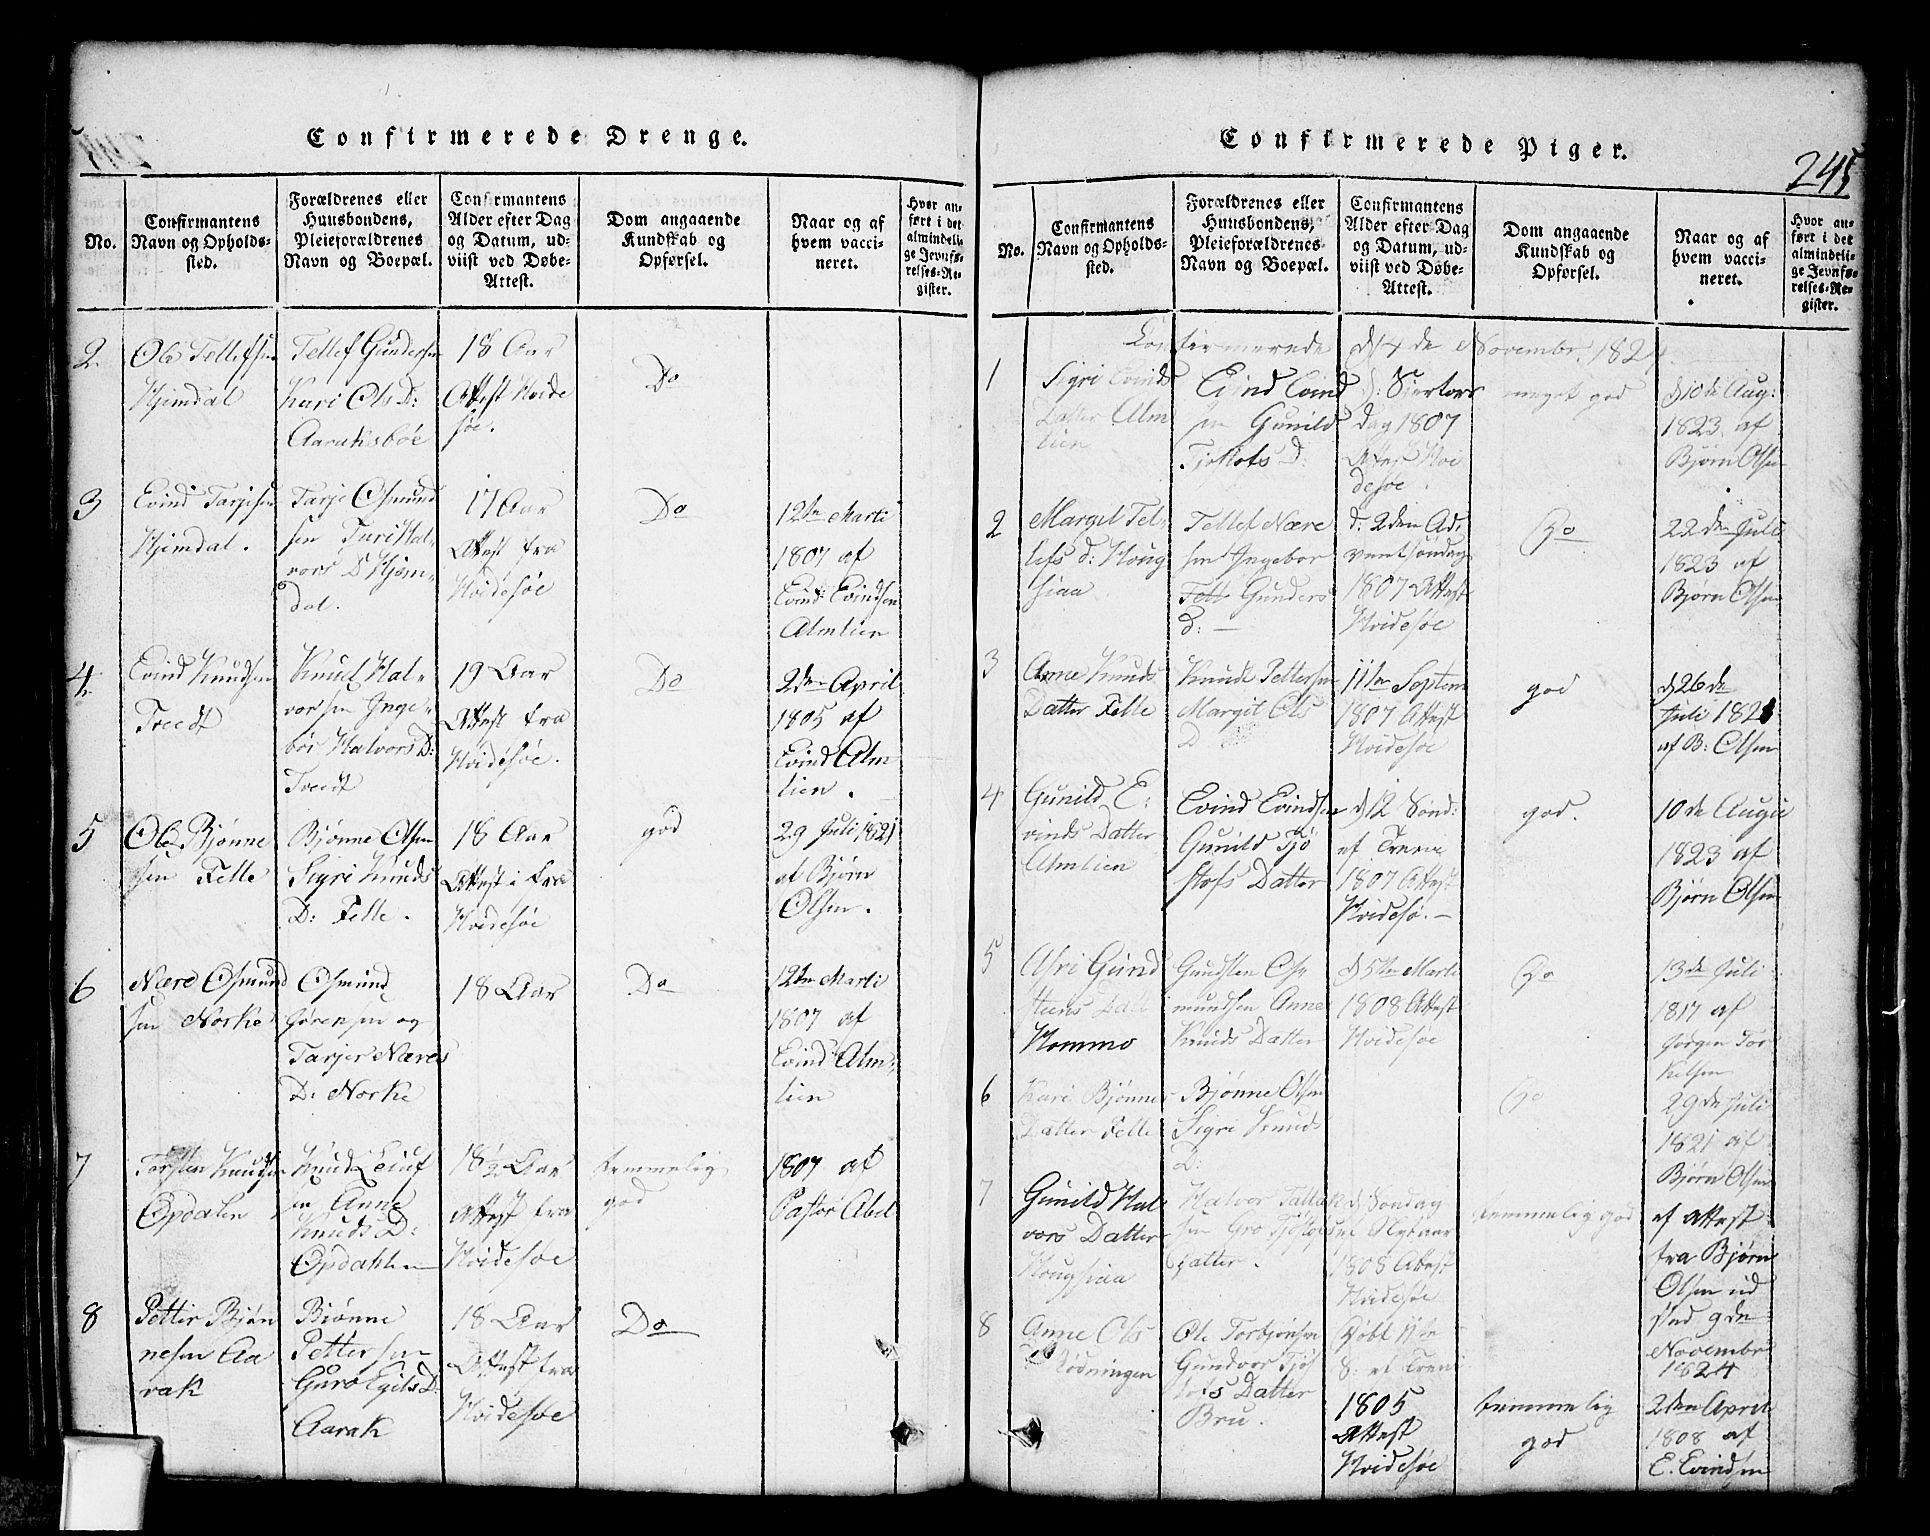 SAKO, Nissedal kirkebøker, G/Gb/L0001: Klokkerbok nr. II 1, 1814-1862, s. 245